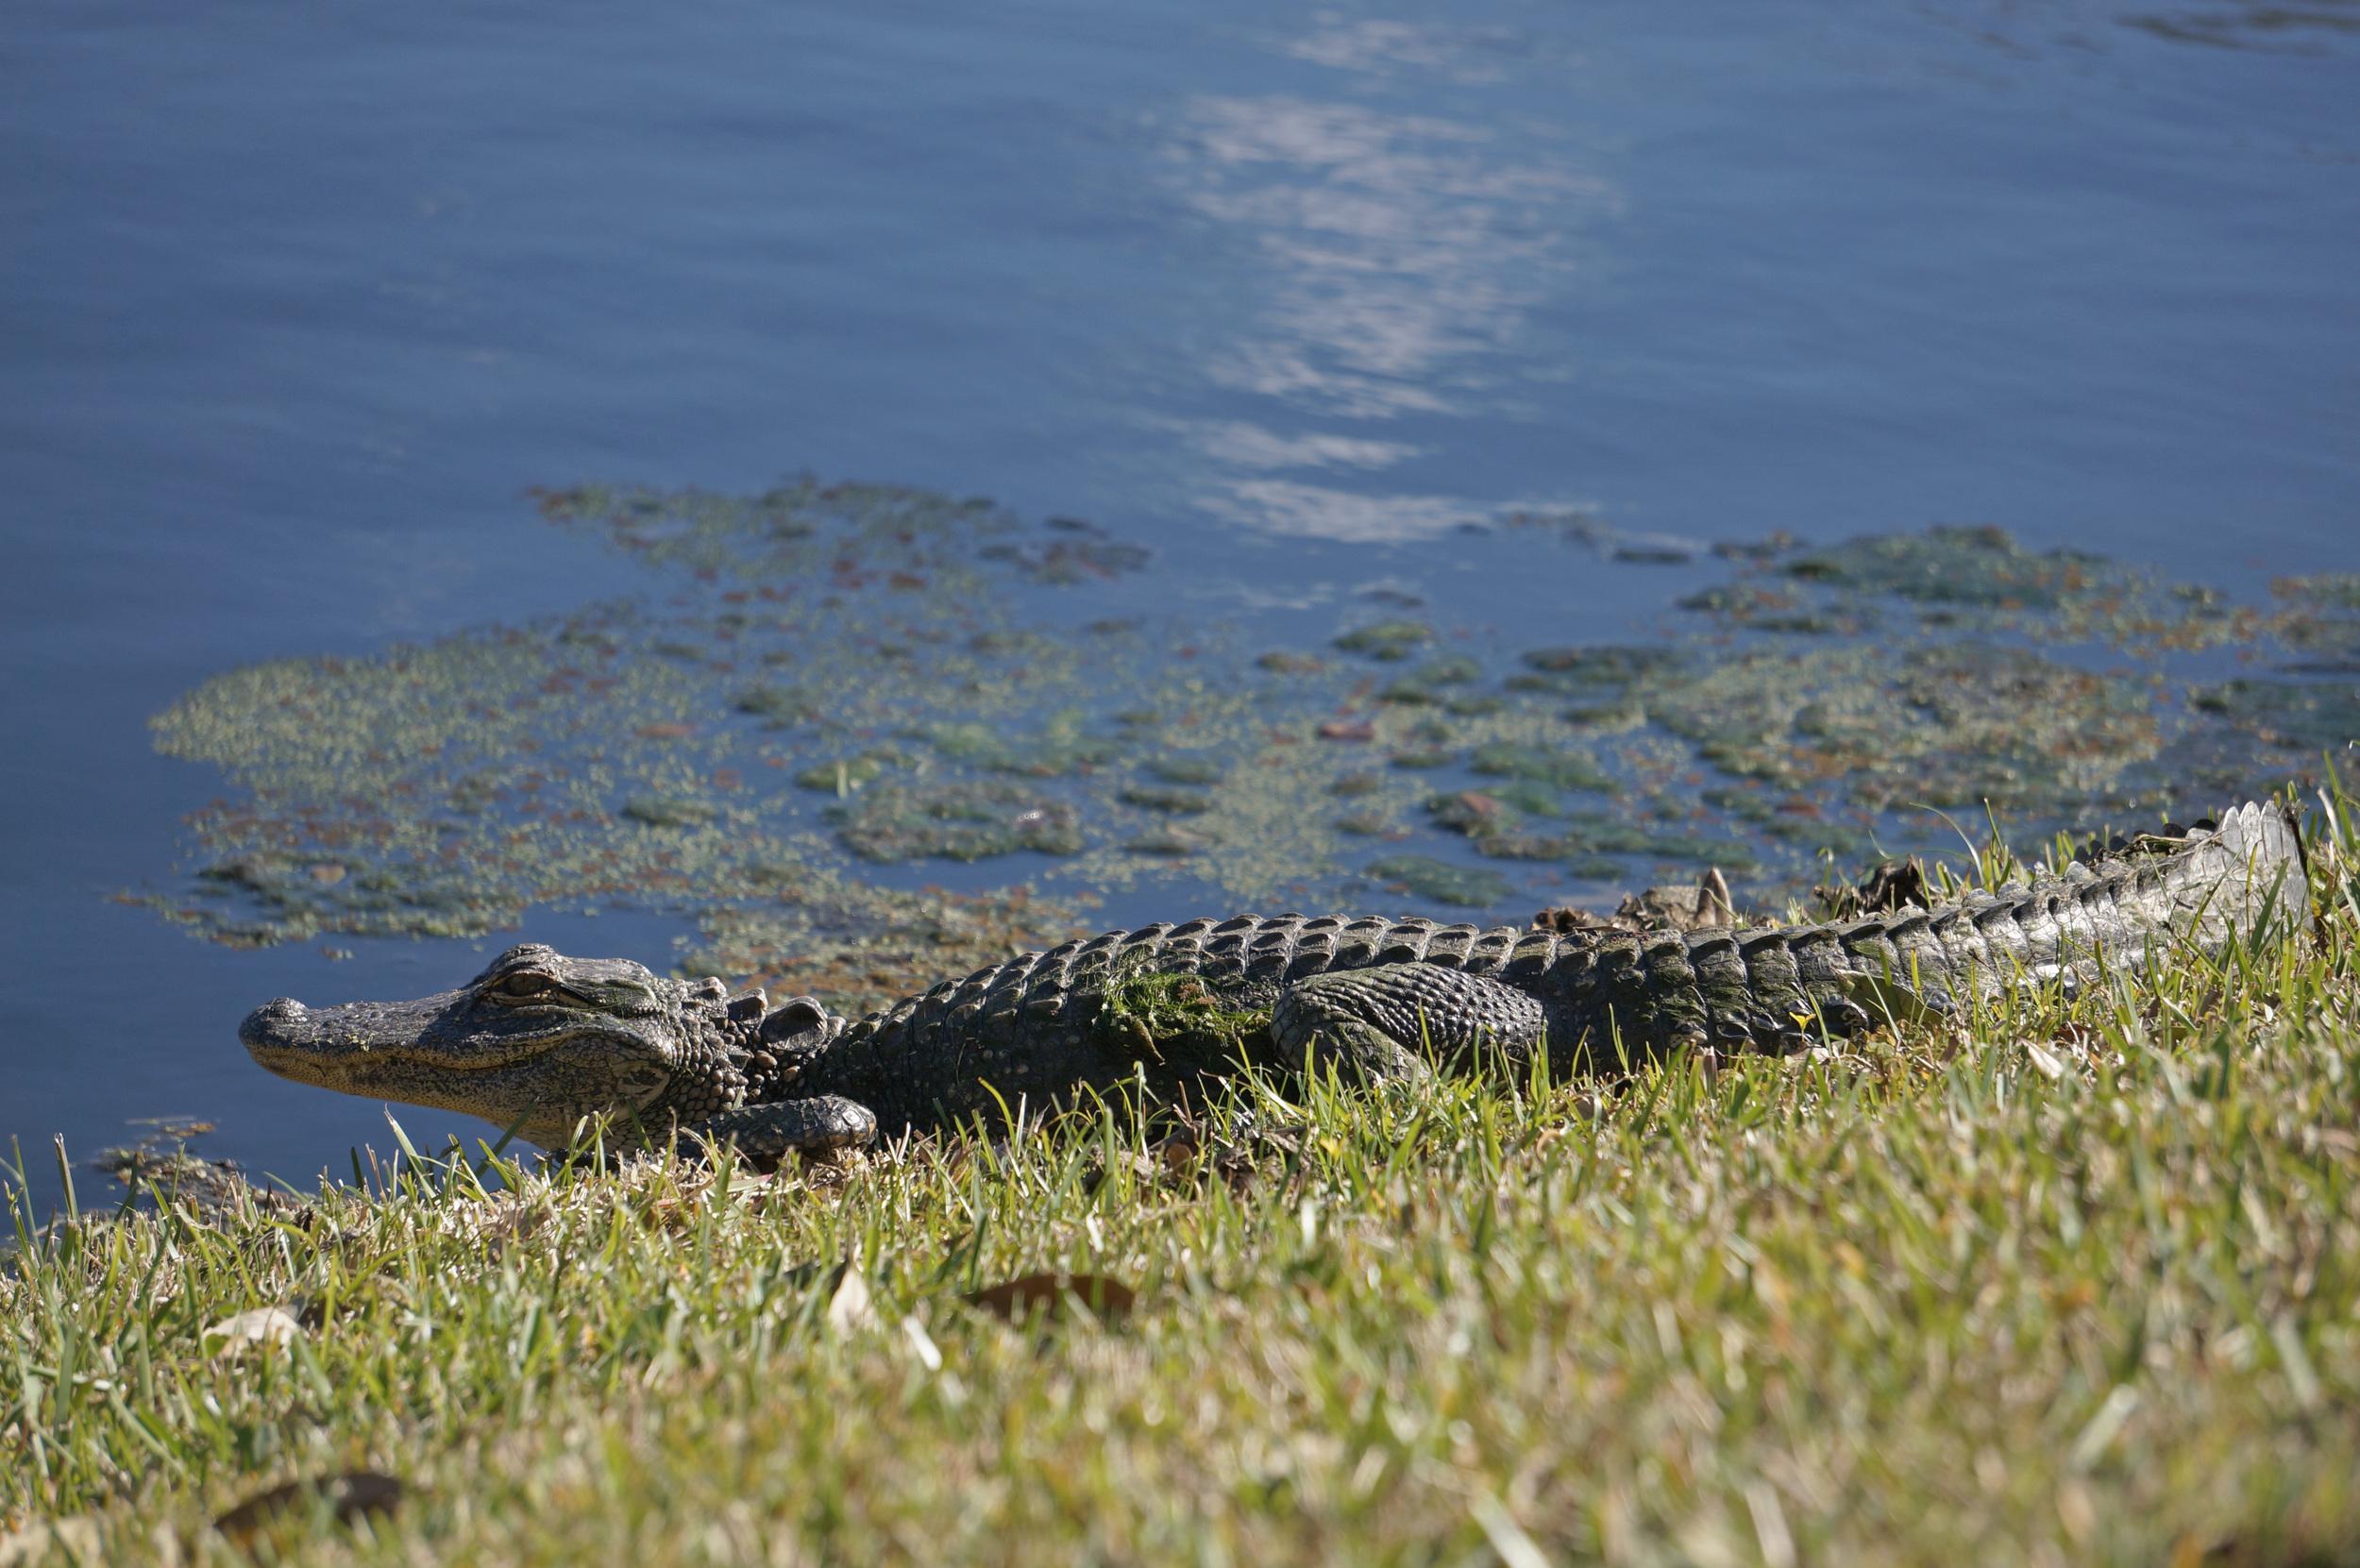 Florida, Alligator